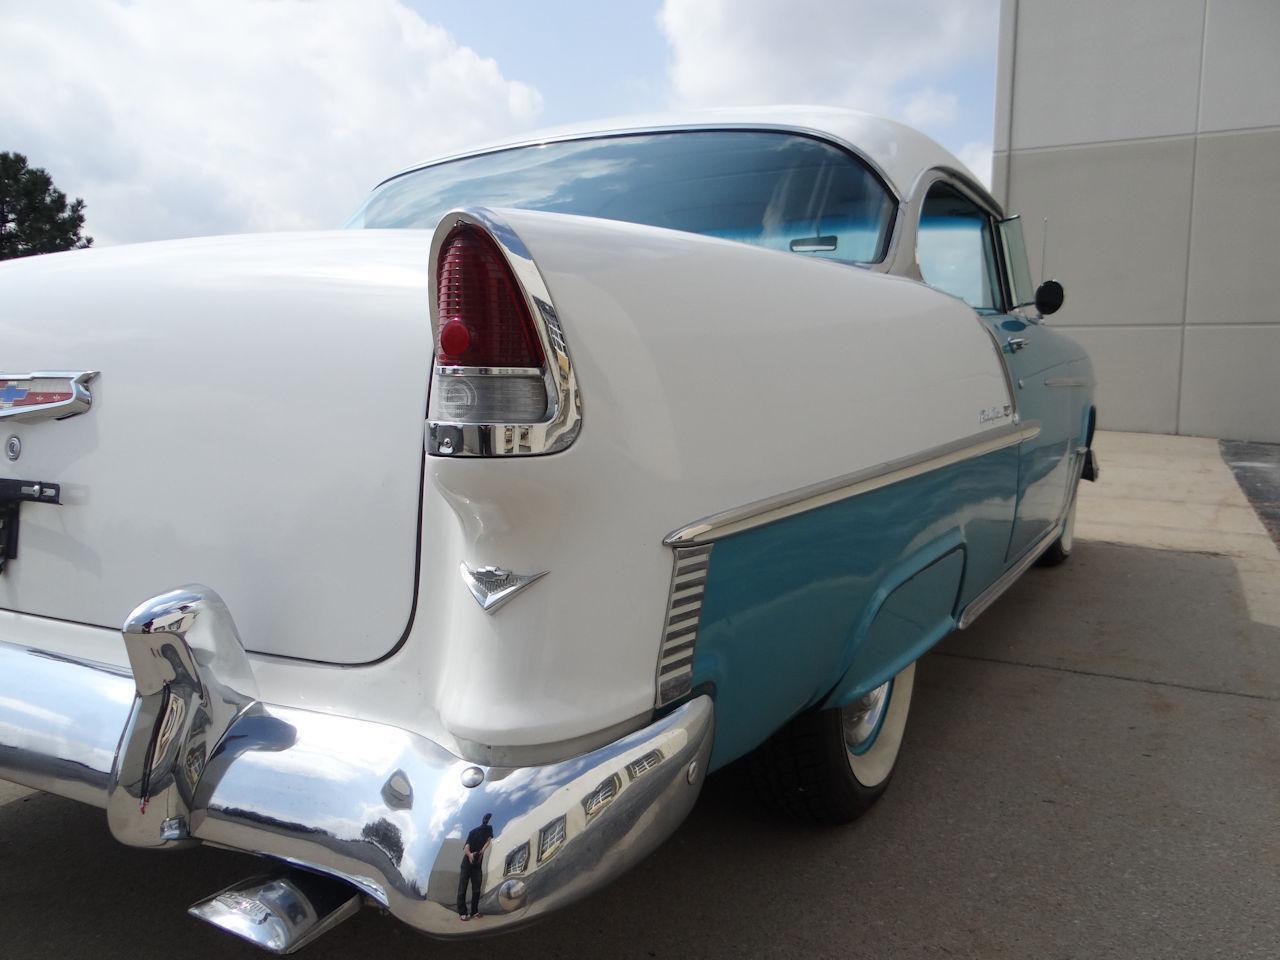 1955 Chevrolet Bel Air (CC-1375294) for sale in O'Fallon, Illinois